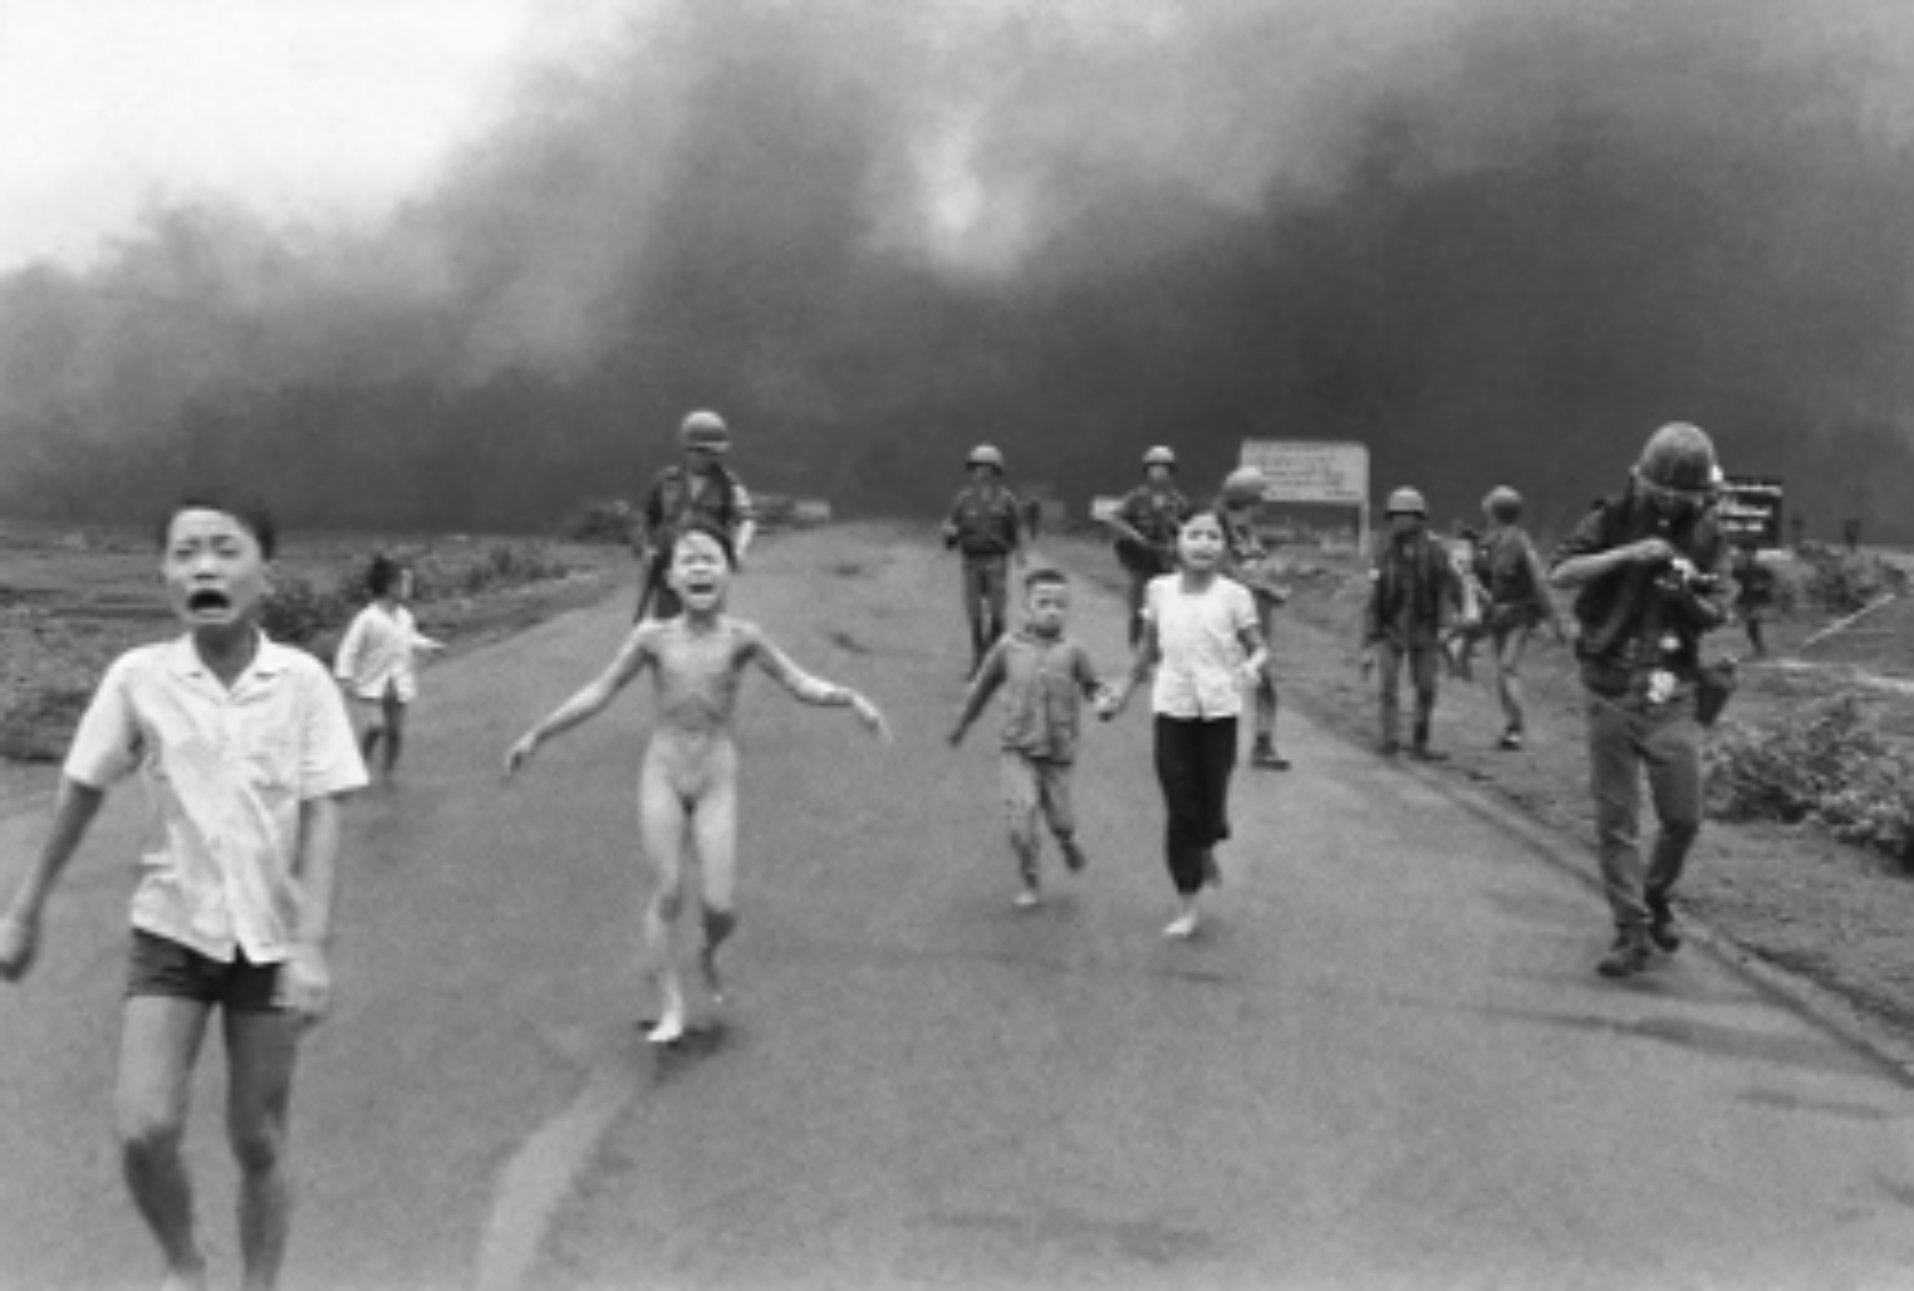 Facebook censura imagen emblemática de la guerra de Vietnam